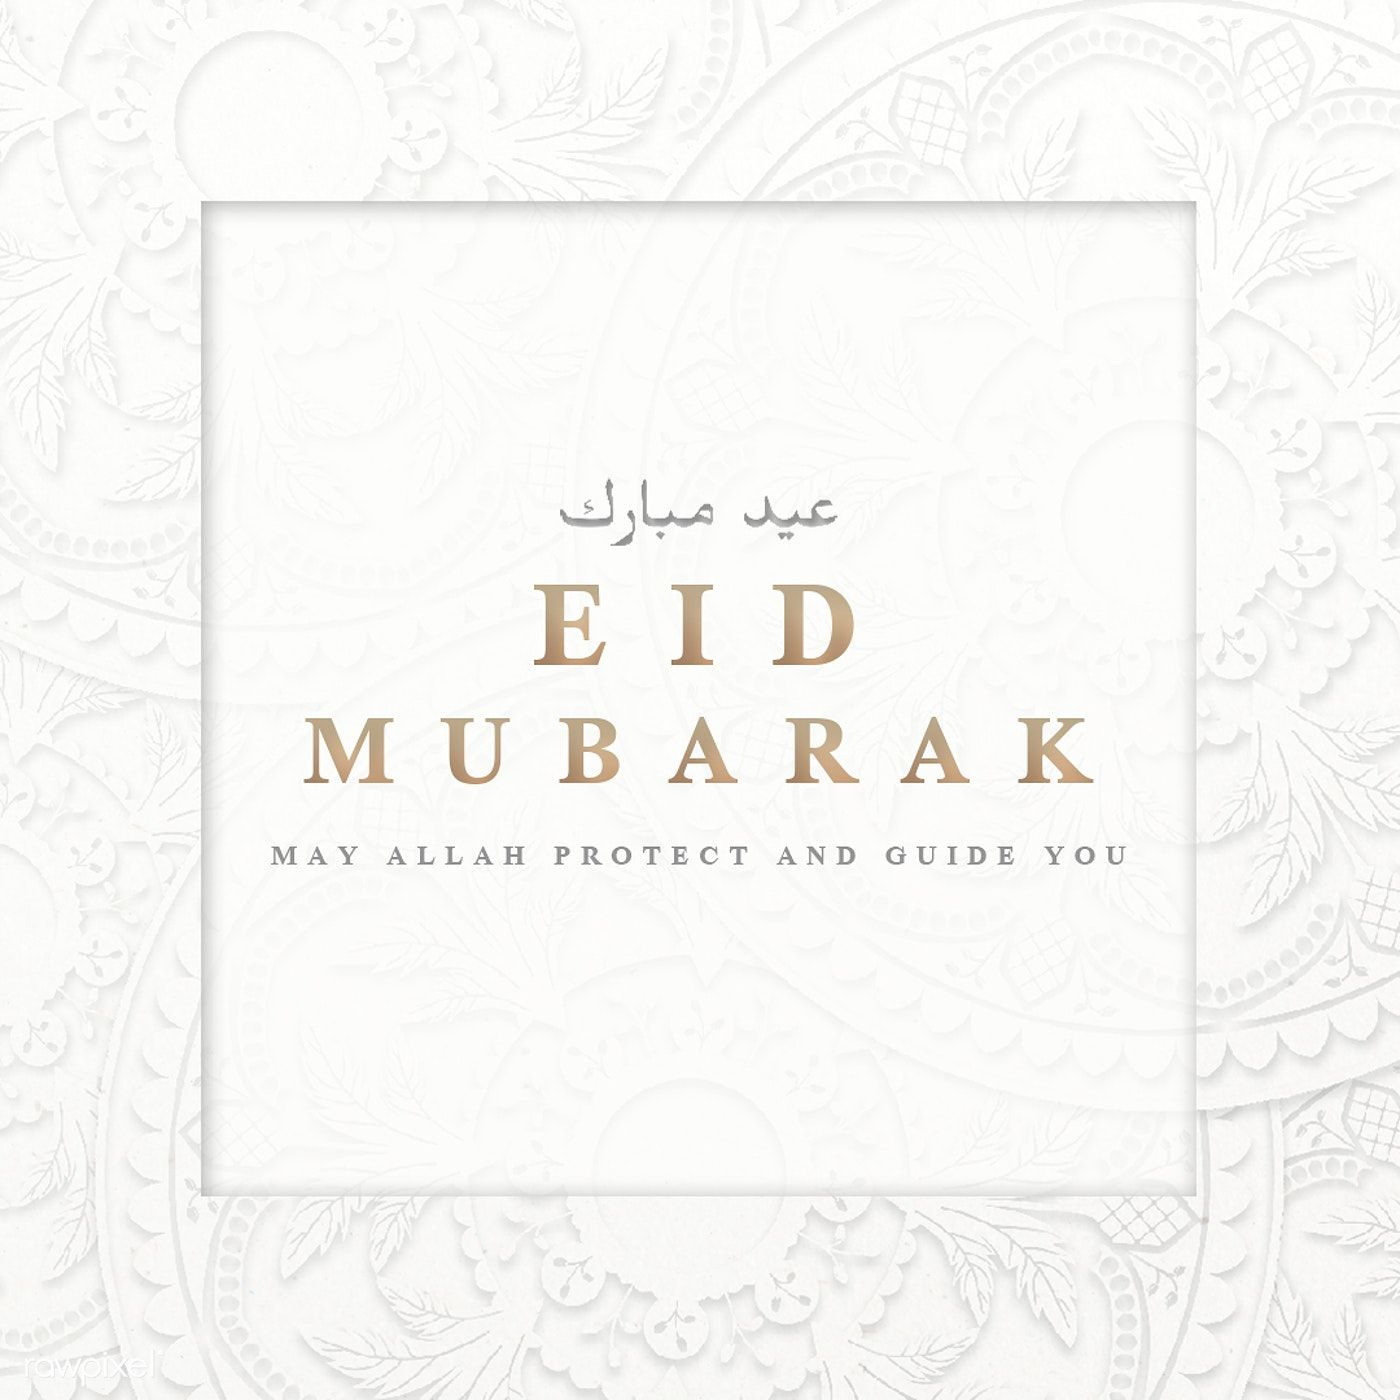 Festive Eid Mubarak Greeting Card Template Free Image By